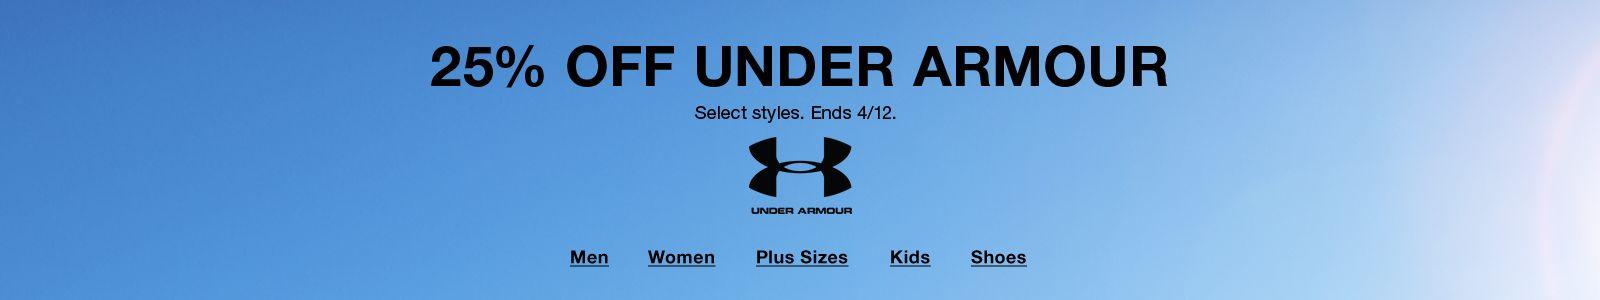 25% Off Under Armour, Select styles, Ends 4/12,Men, Women, Plus Sizes, Kids, Shoes